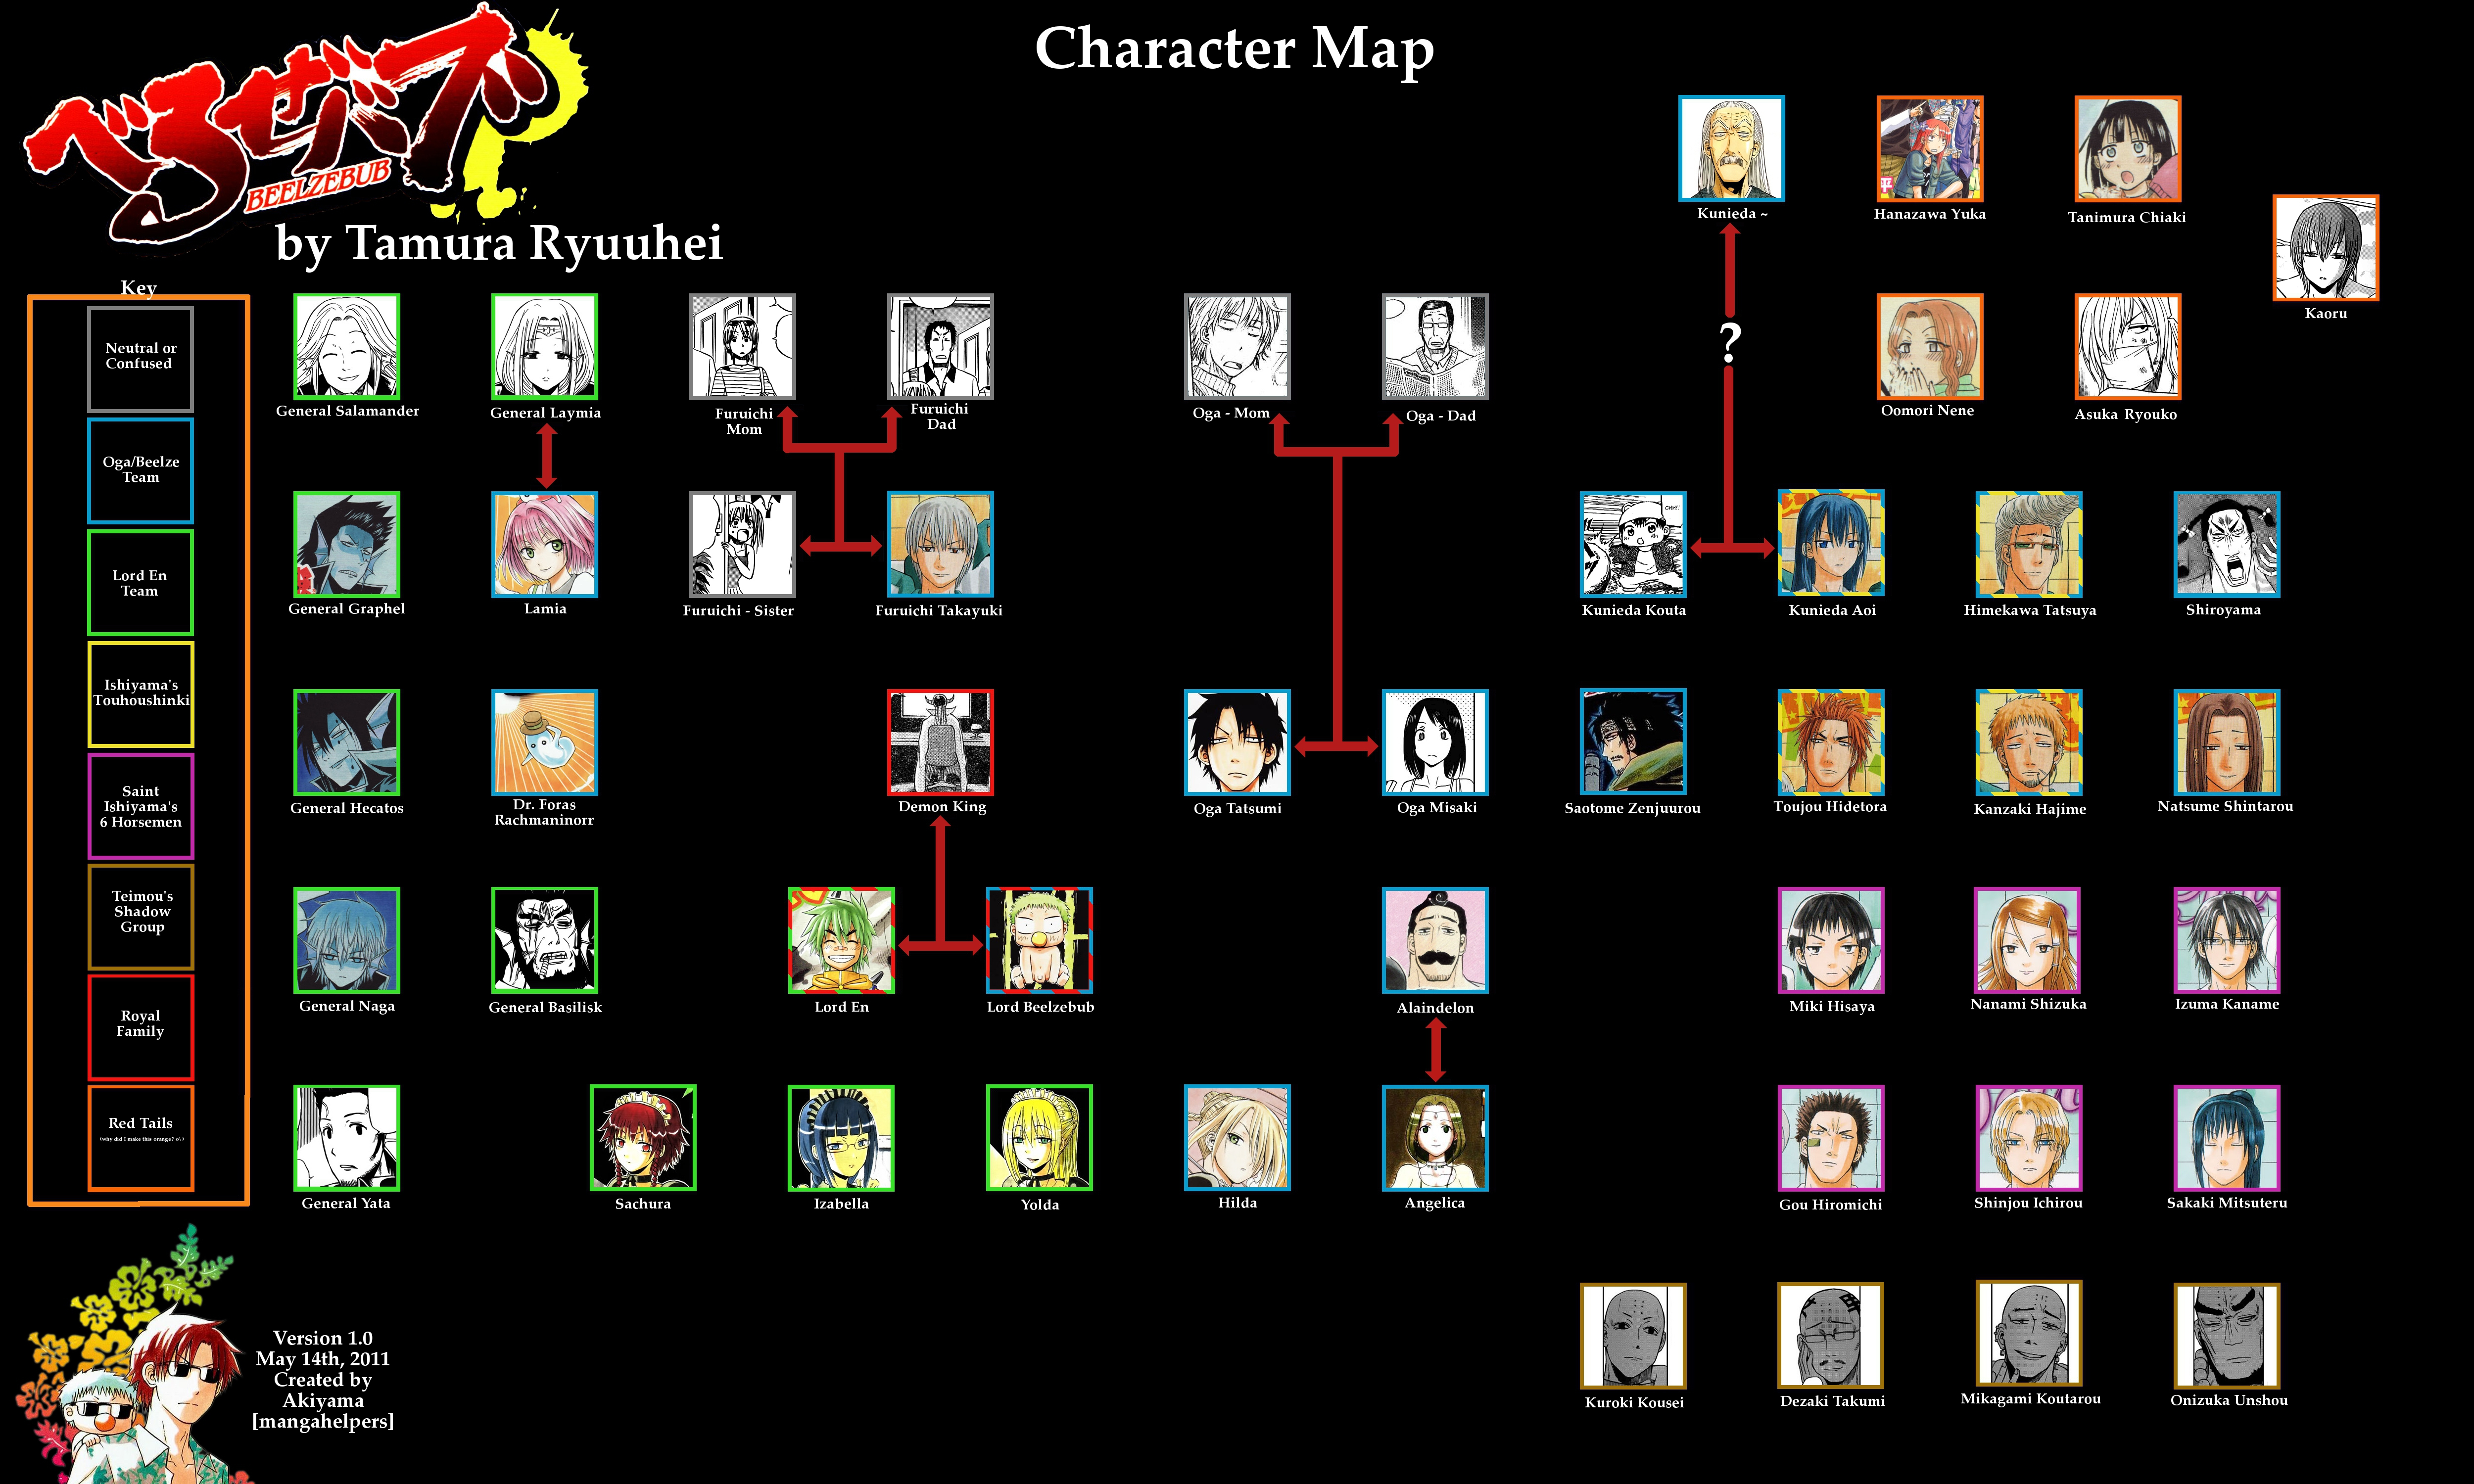 -http://images3.wikia.nocookie.net/__cb20110519131230/beelzebub/images/f/f8/Beelzebub_Character_Map.jpg